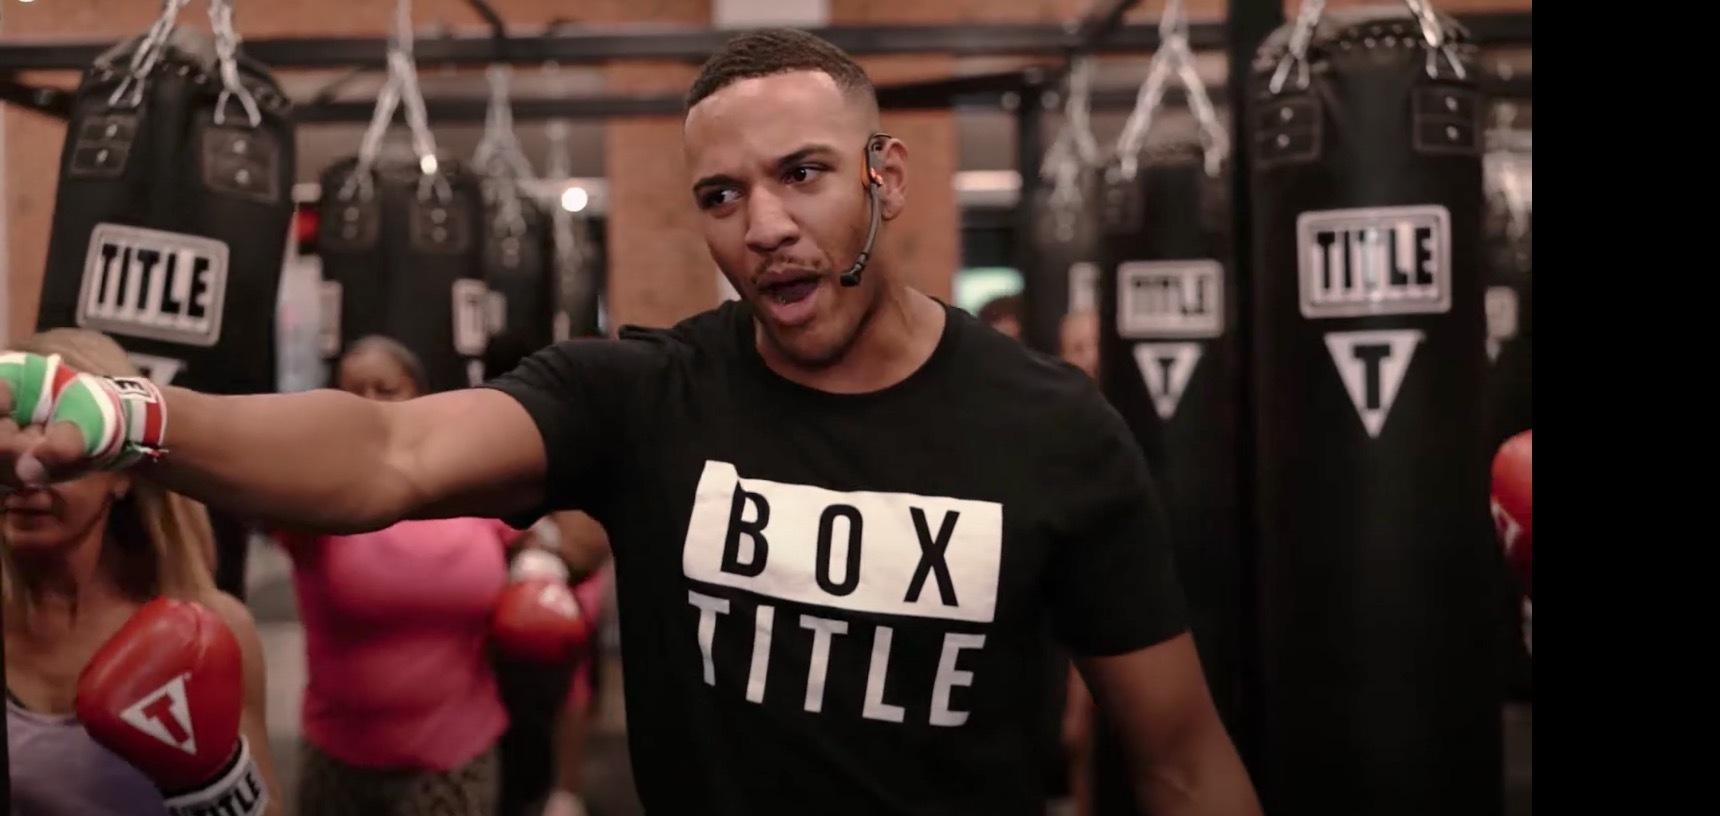 Client - Title Boxing, Location - Baton Rouge, Purpose - Hype